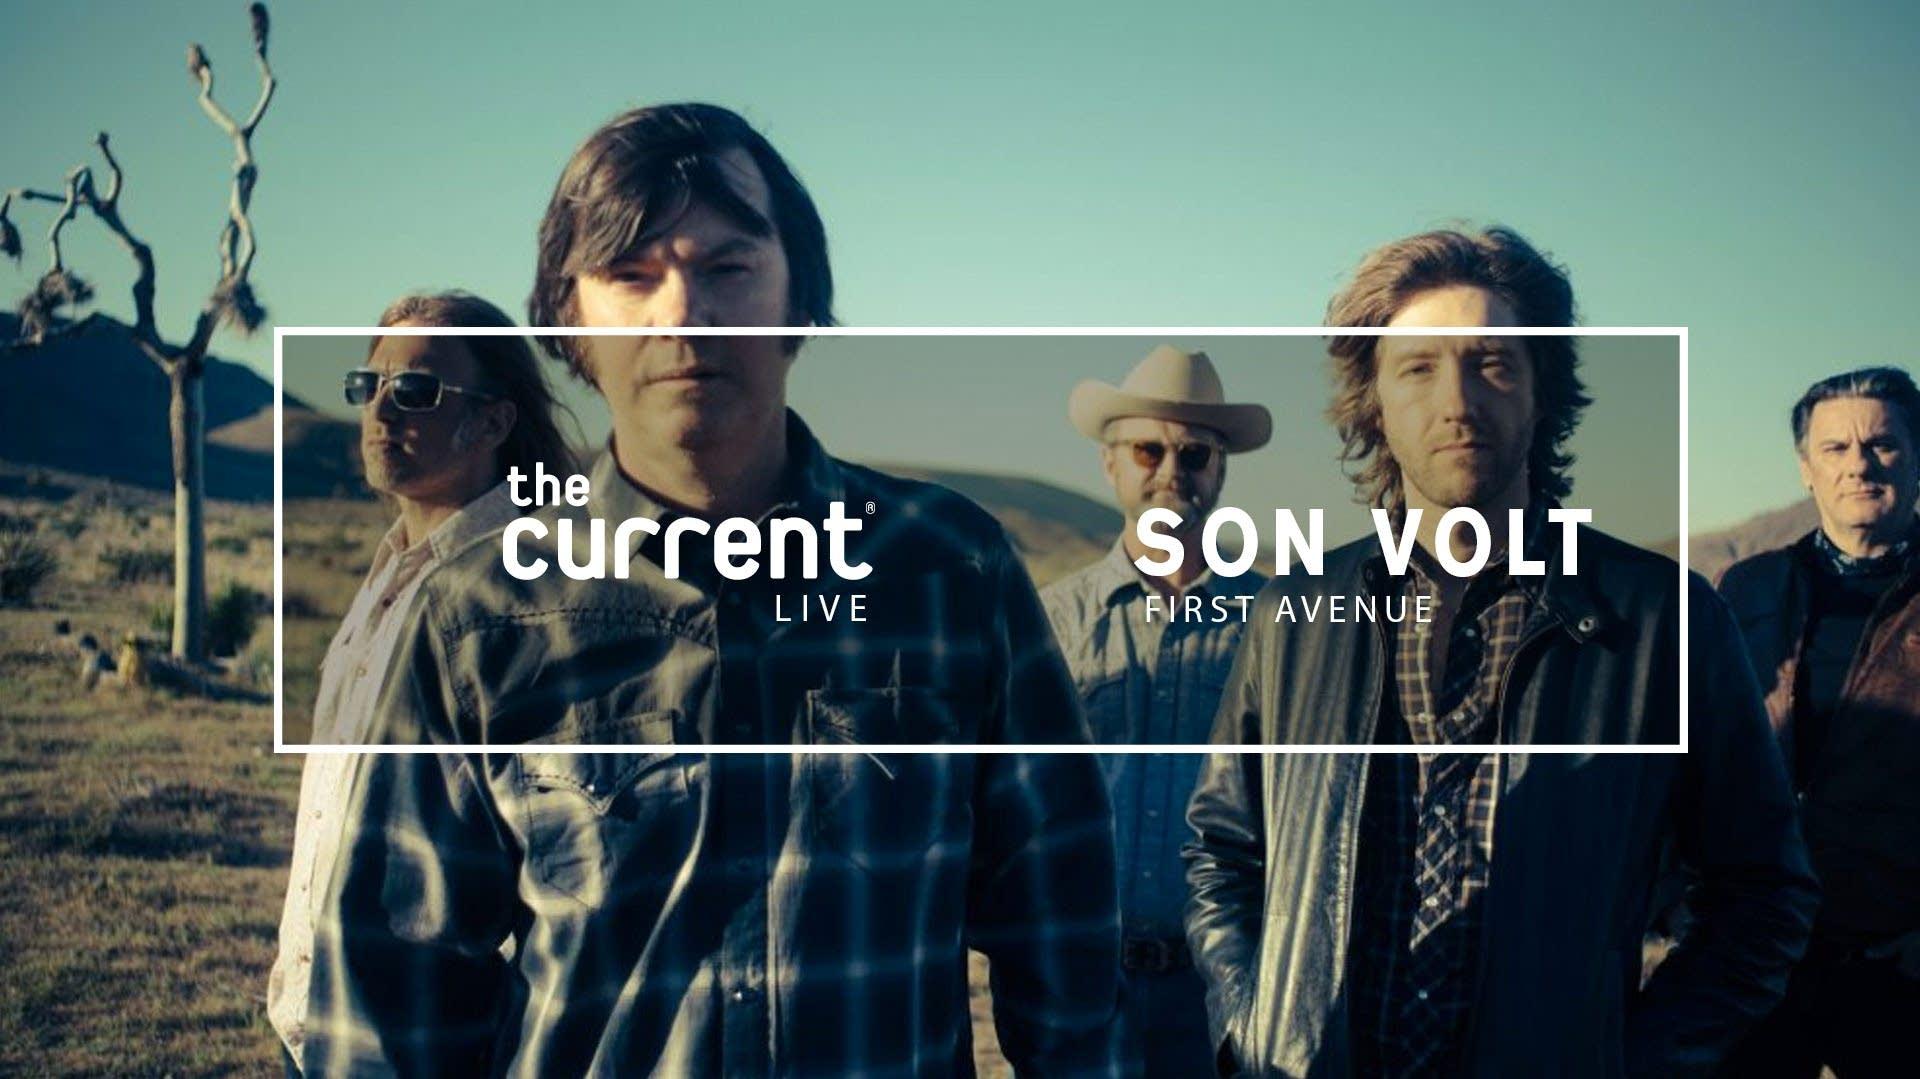 son-volt-live-first-avenue